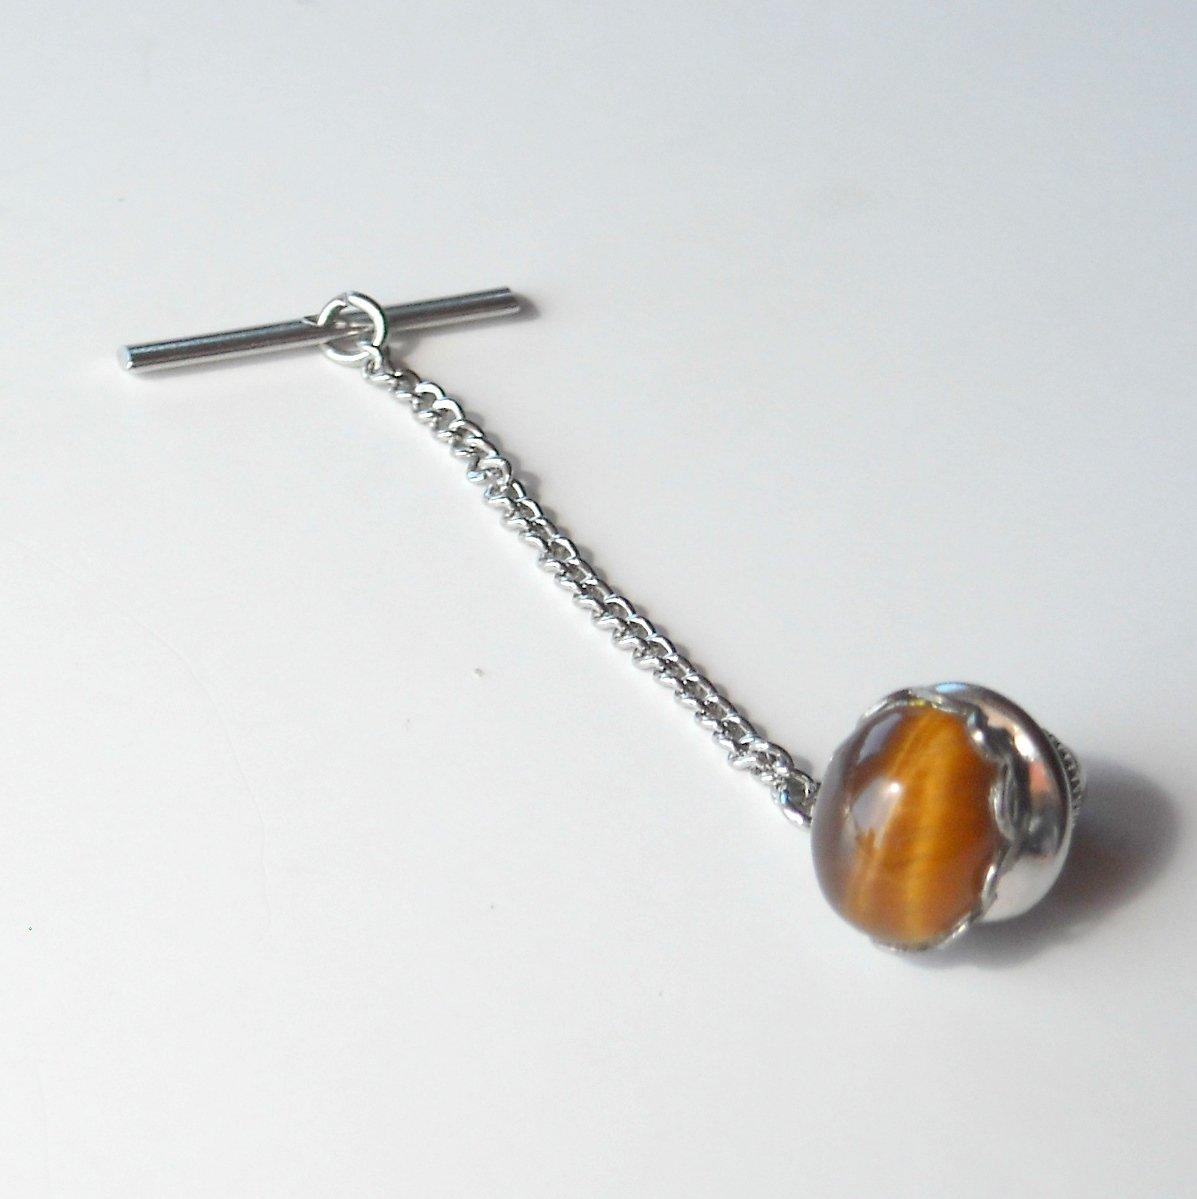 Tiger Eye Silver color alloy necktie tack clutch pin